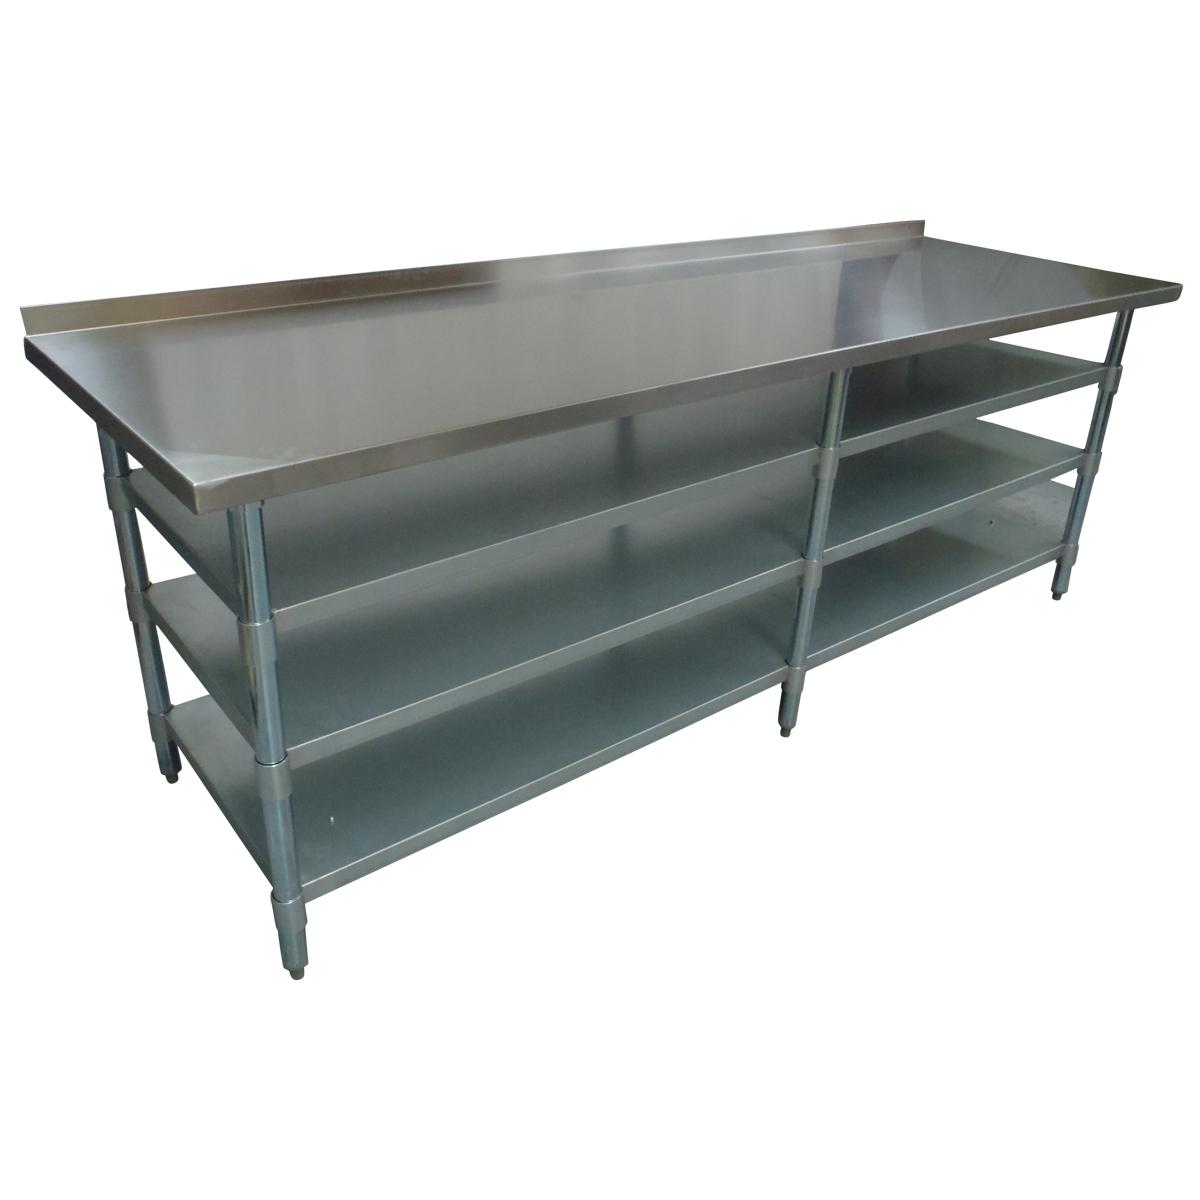 2134 x 762mm new work corner bench kitchen table 3. Black Bedroom Furniture Sets. Home Design Ideas